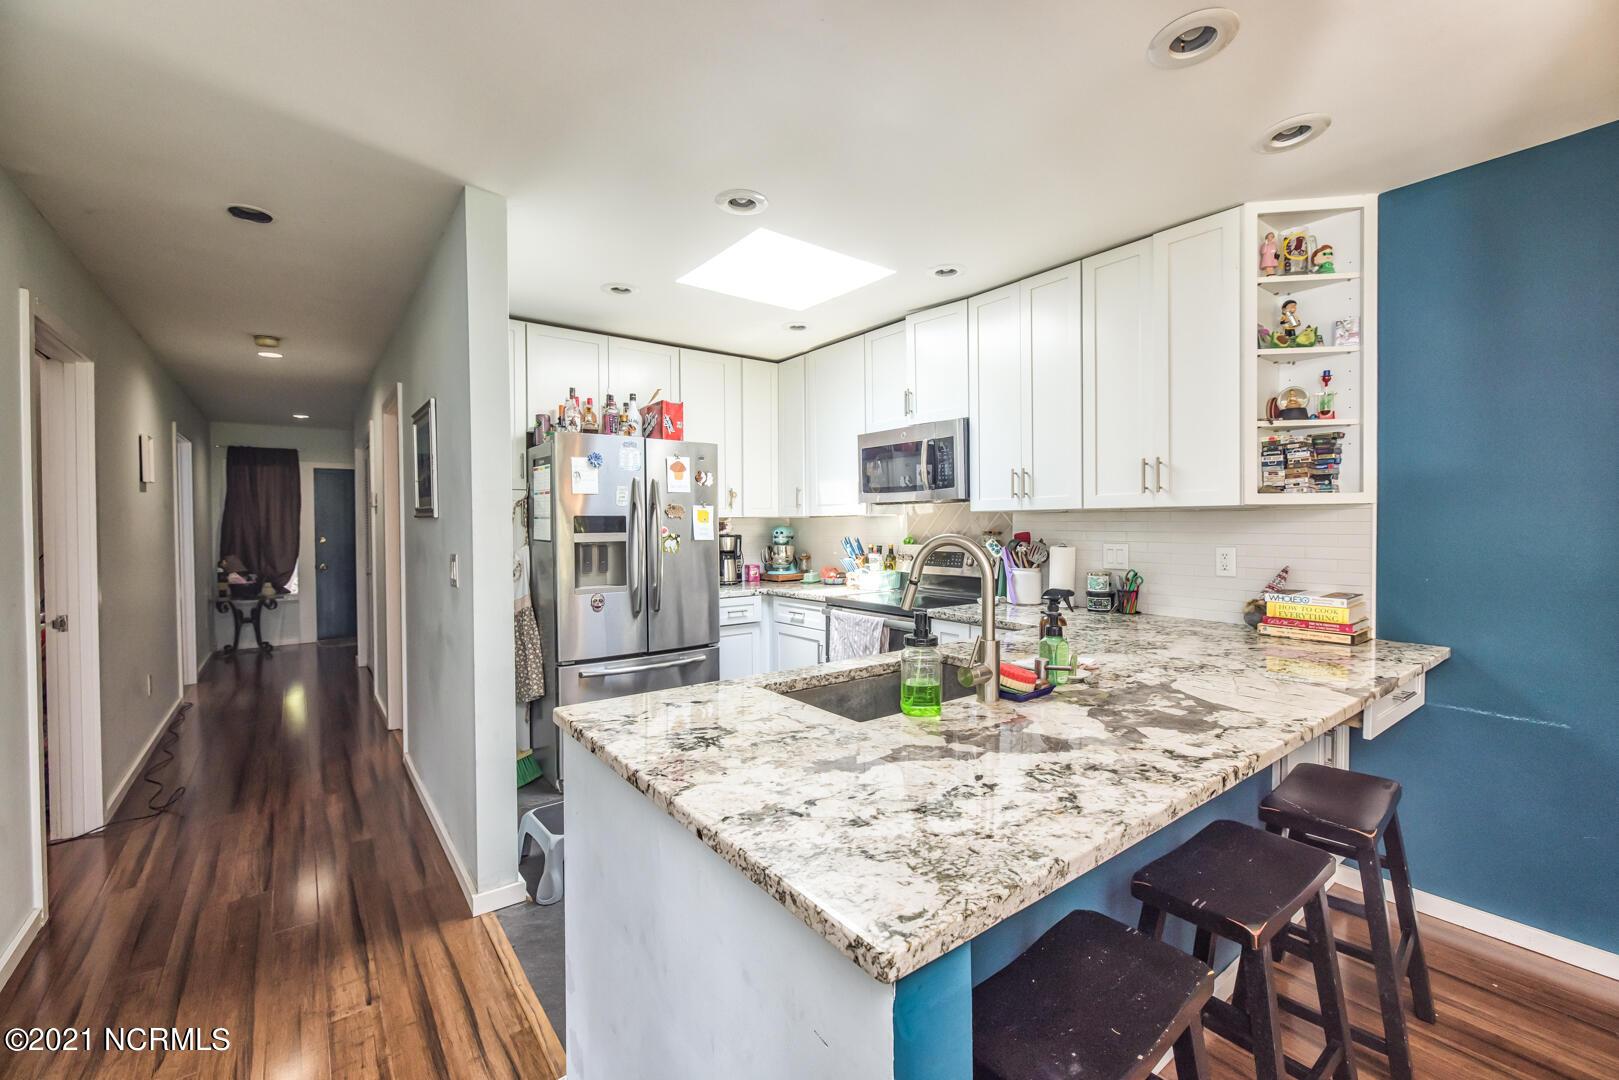 125 Belvedere Drive, Hampstead, North Carolina 28443, 3 Bedrooms Bedrooms, 6 Rooms Rooms,2 BathroomsBathrooms,Townhouse,For sale,Belvedere,100286015